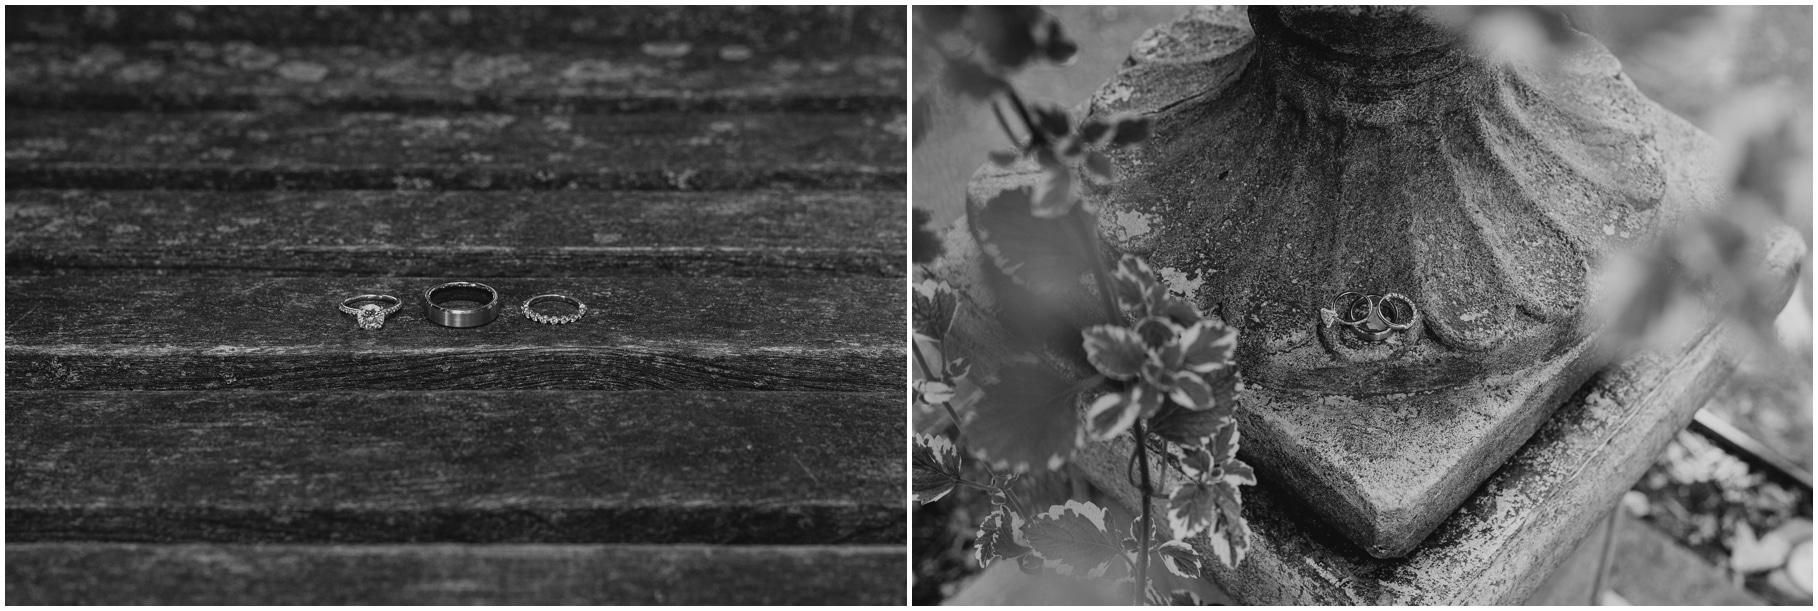 adam lowe photography, columbus, ohio, midwest, photographer, style, love, stylish, fpc, franklin park conservatory, wedding photographer,jan kish, flowerman, sadie baby sweets, martini affair, berta bridal, paris, debra moreland, generation tux, Reverly, azazie, kate mari, badgley mischka, dunkirk designs, miss design berry